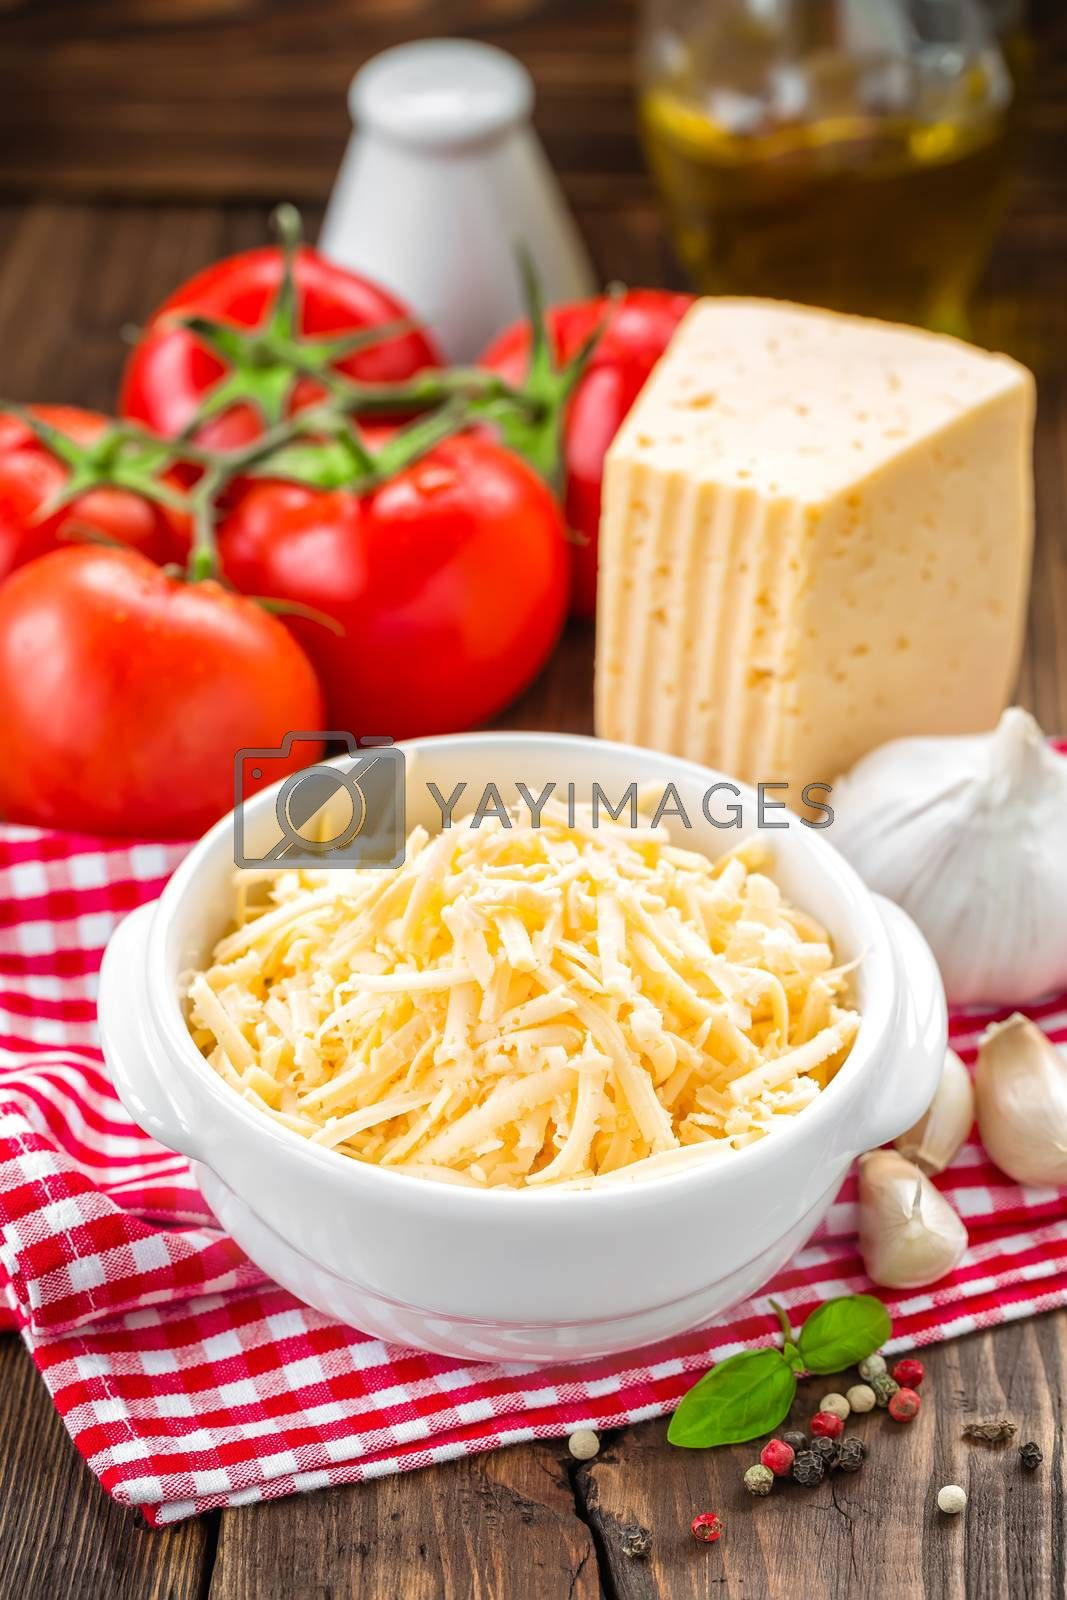 Royalty free image of Grated cheese by yelenayemchuk